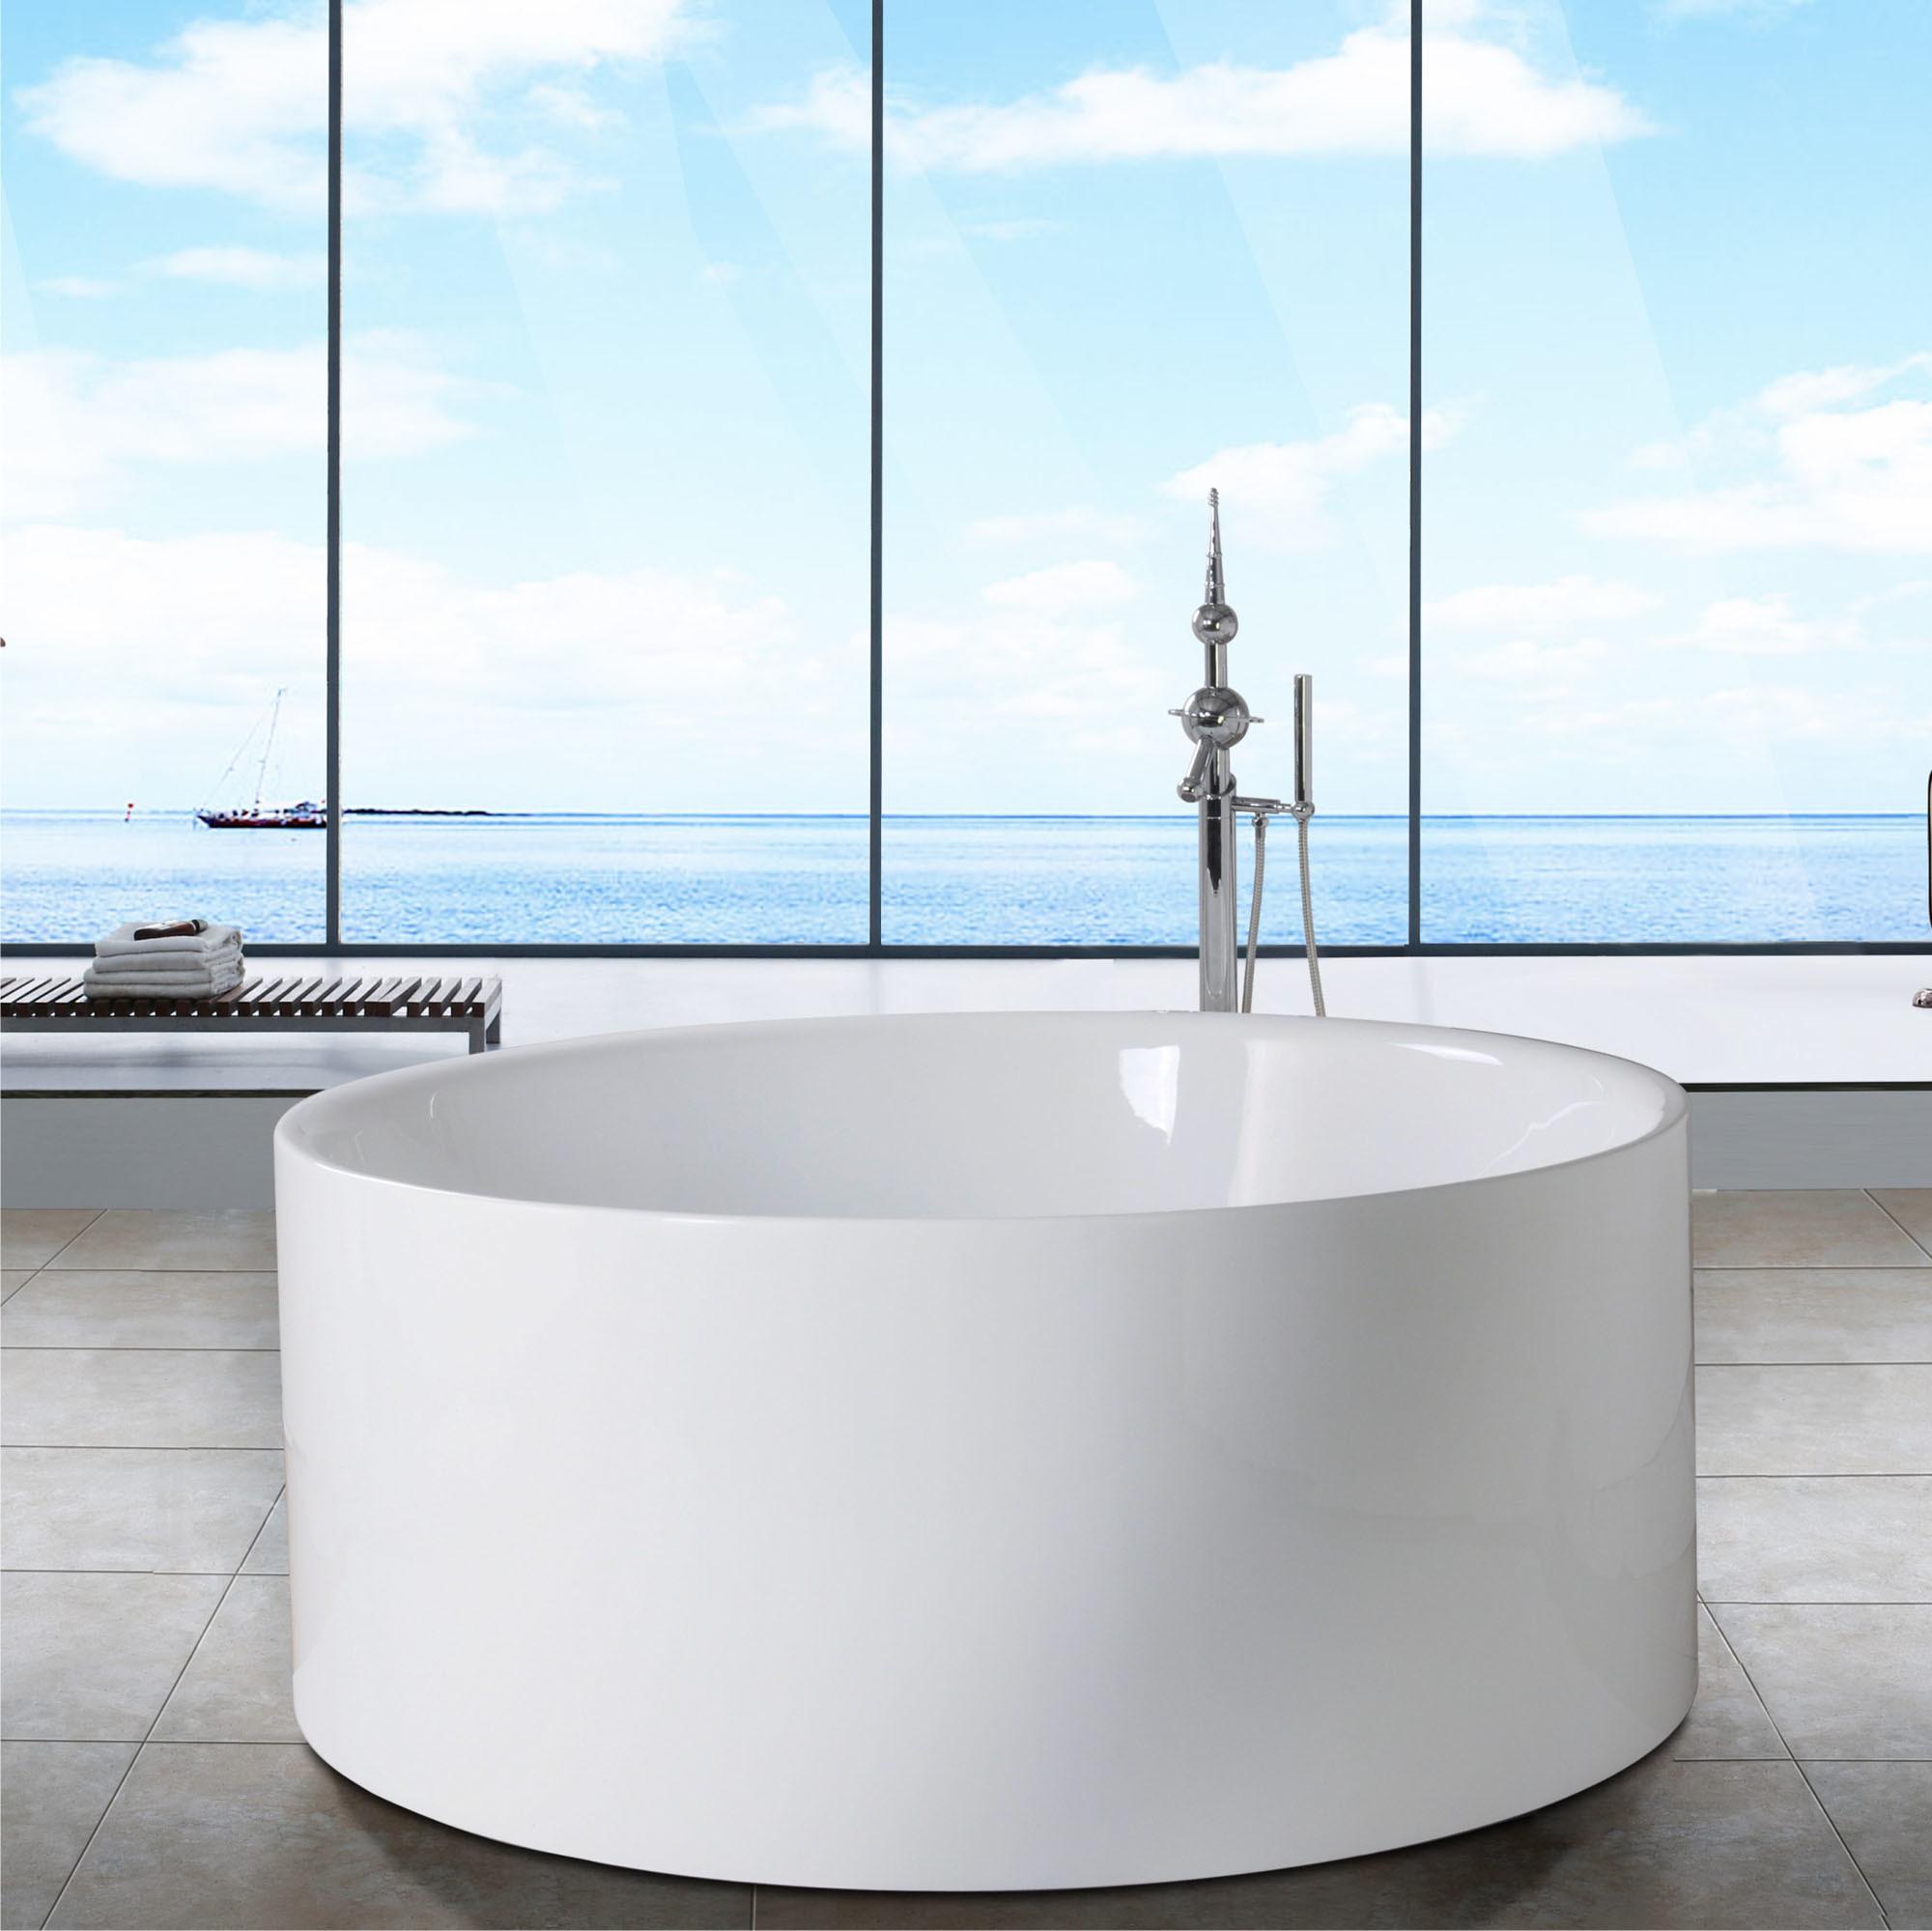 Vasca da bagno rotonda bf 6638 vasca da bagno rotonda bf 6638fornito dafoshan bofeng sanitary - Vasca da bagno rotonda ...